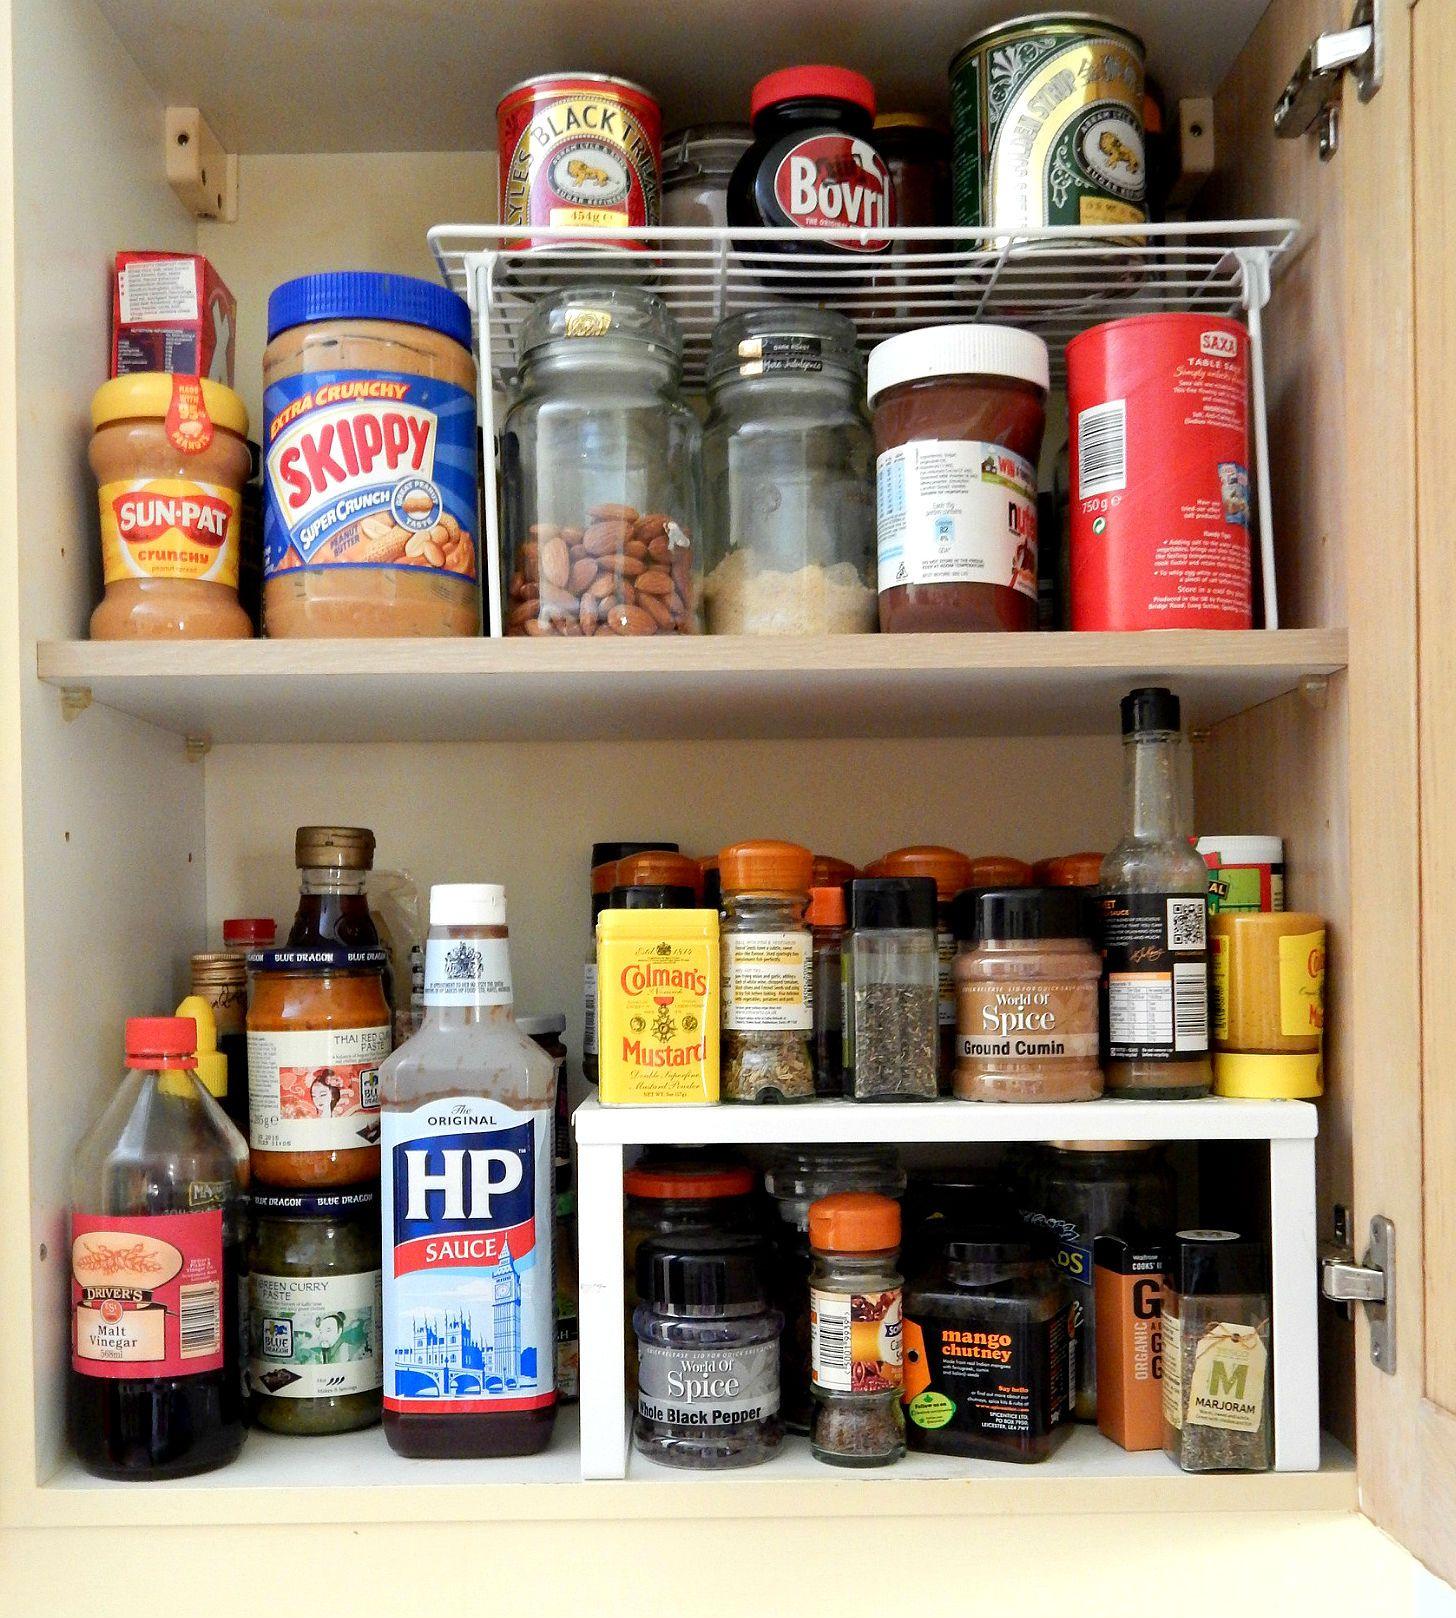 35 smart kitchen storage solutions - guru koala | kitchen storage